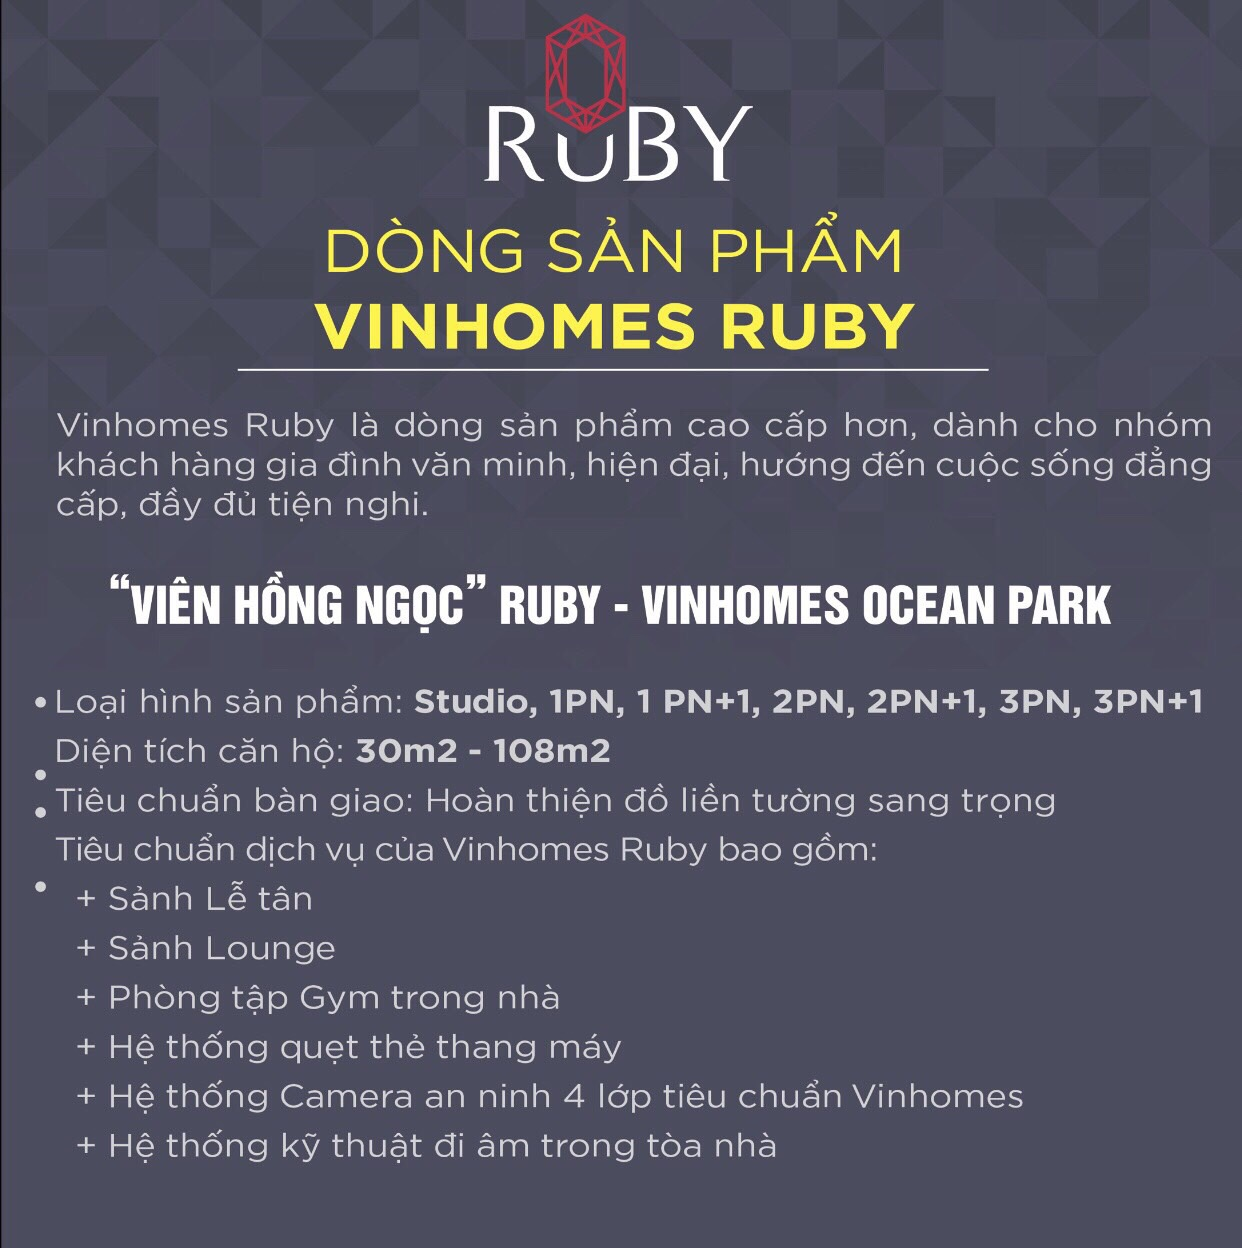 So sanh giữa Vinhomes Ruby và Vinhomes Sapphire